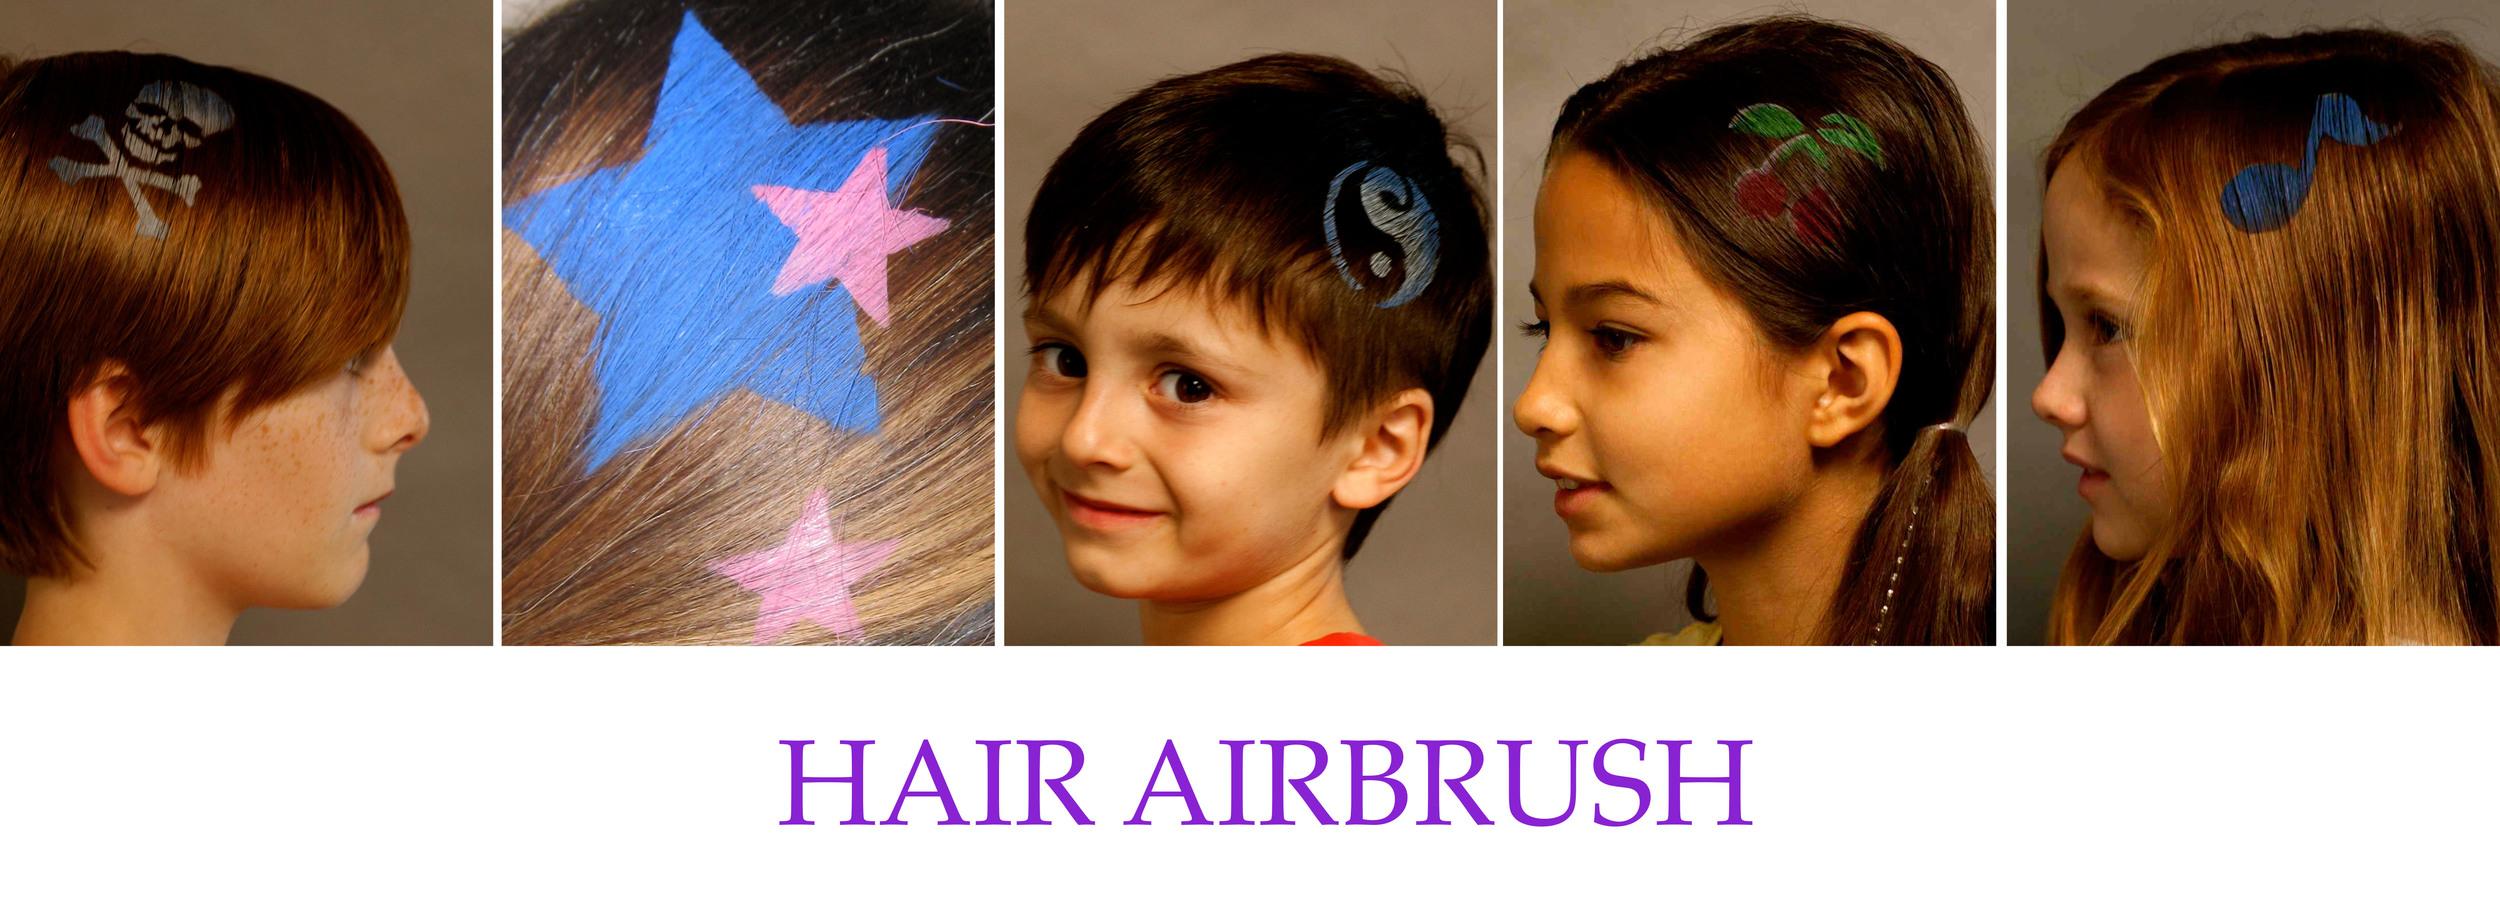 Hair Airbrush We Adorn You.jpg